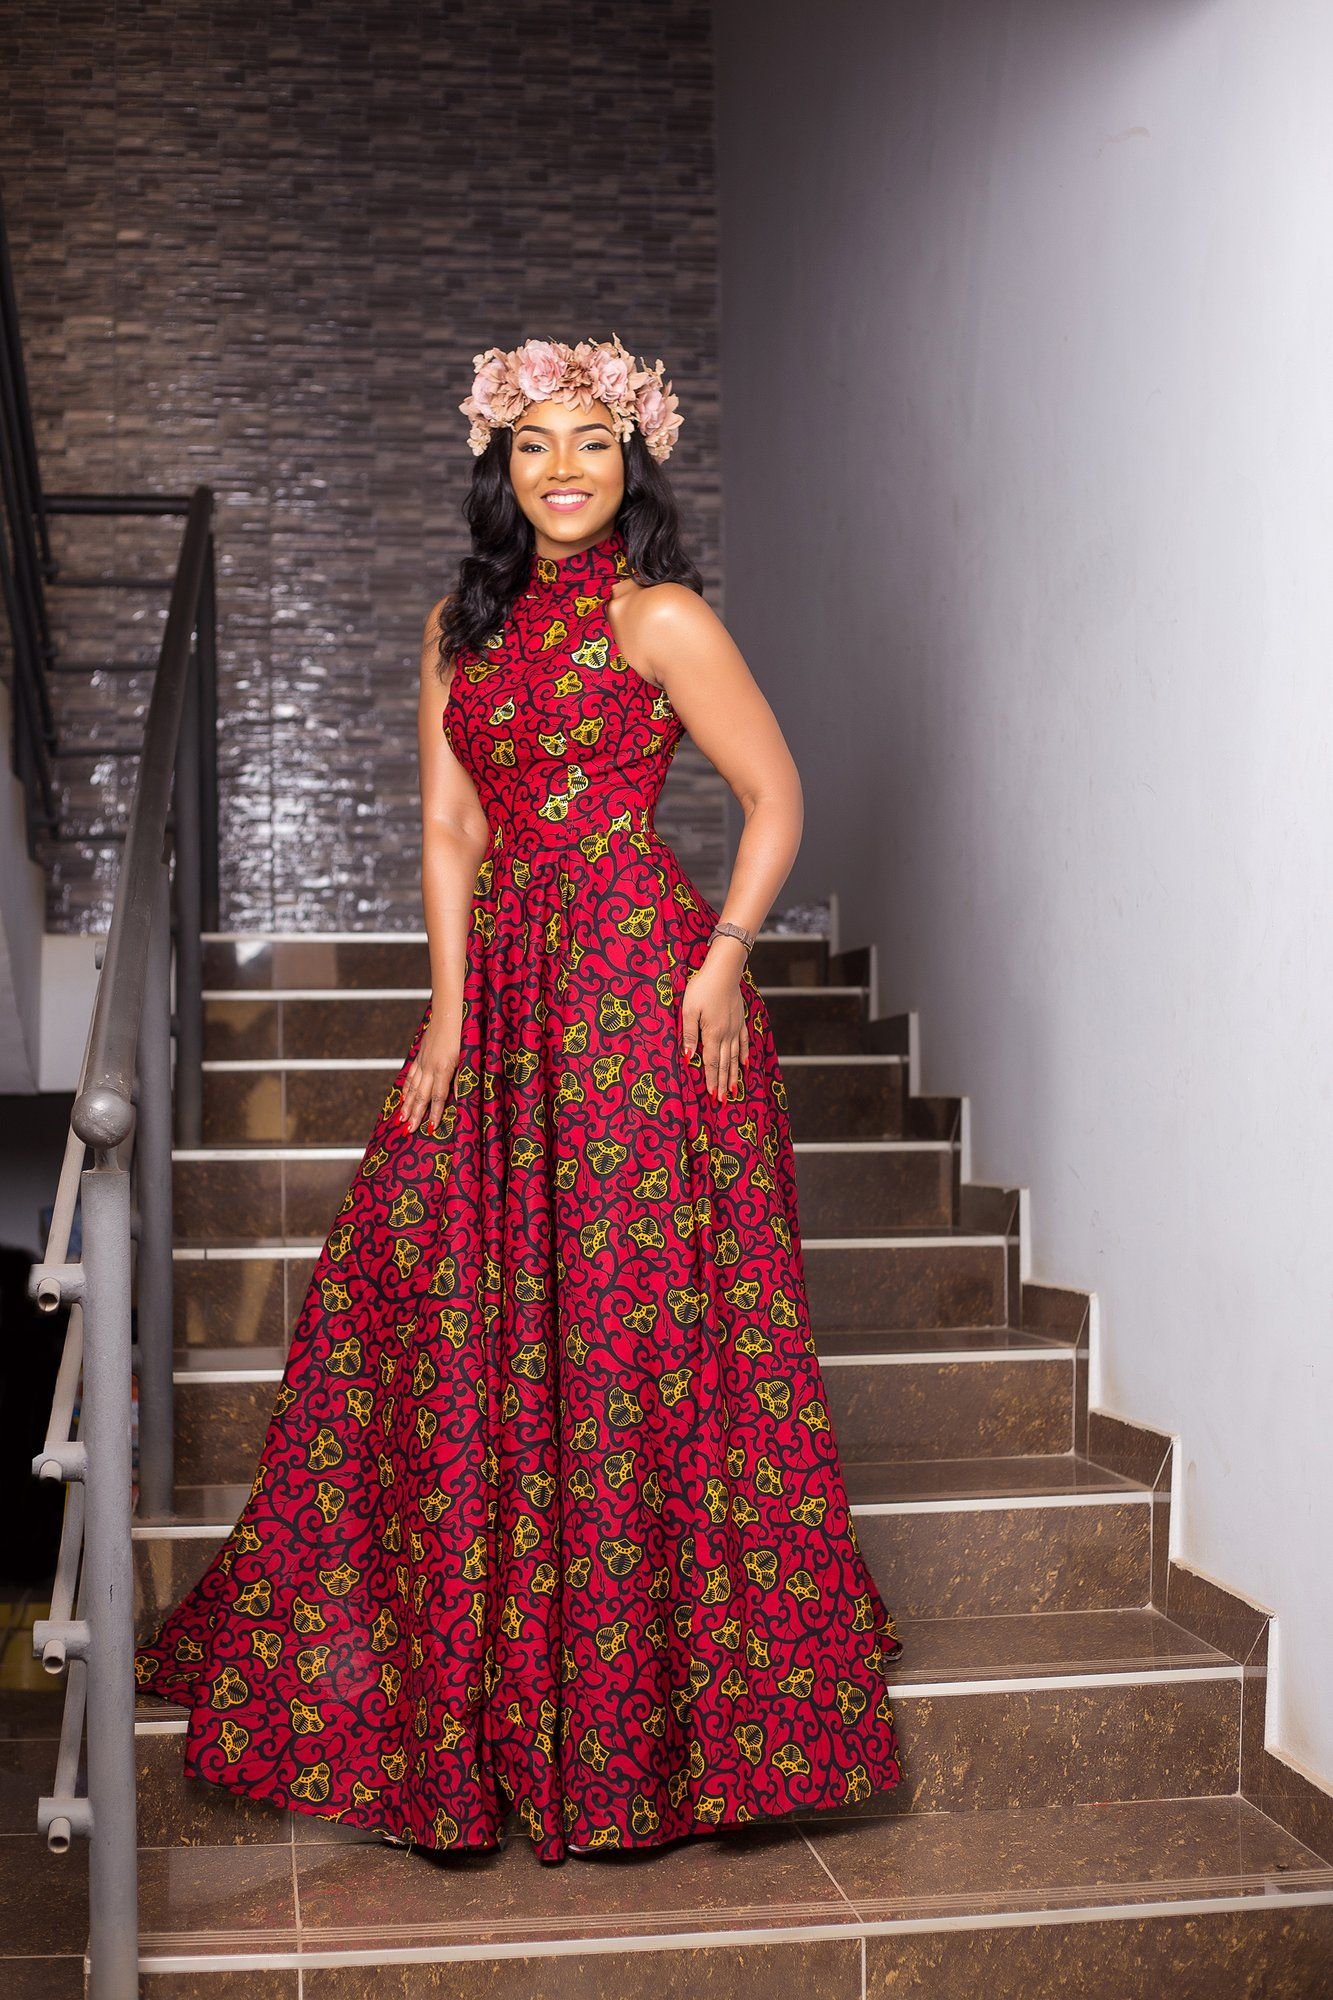 Kessie African Maxi Dress African Maxi Dresses African Dresses For Women African Attire